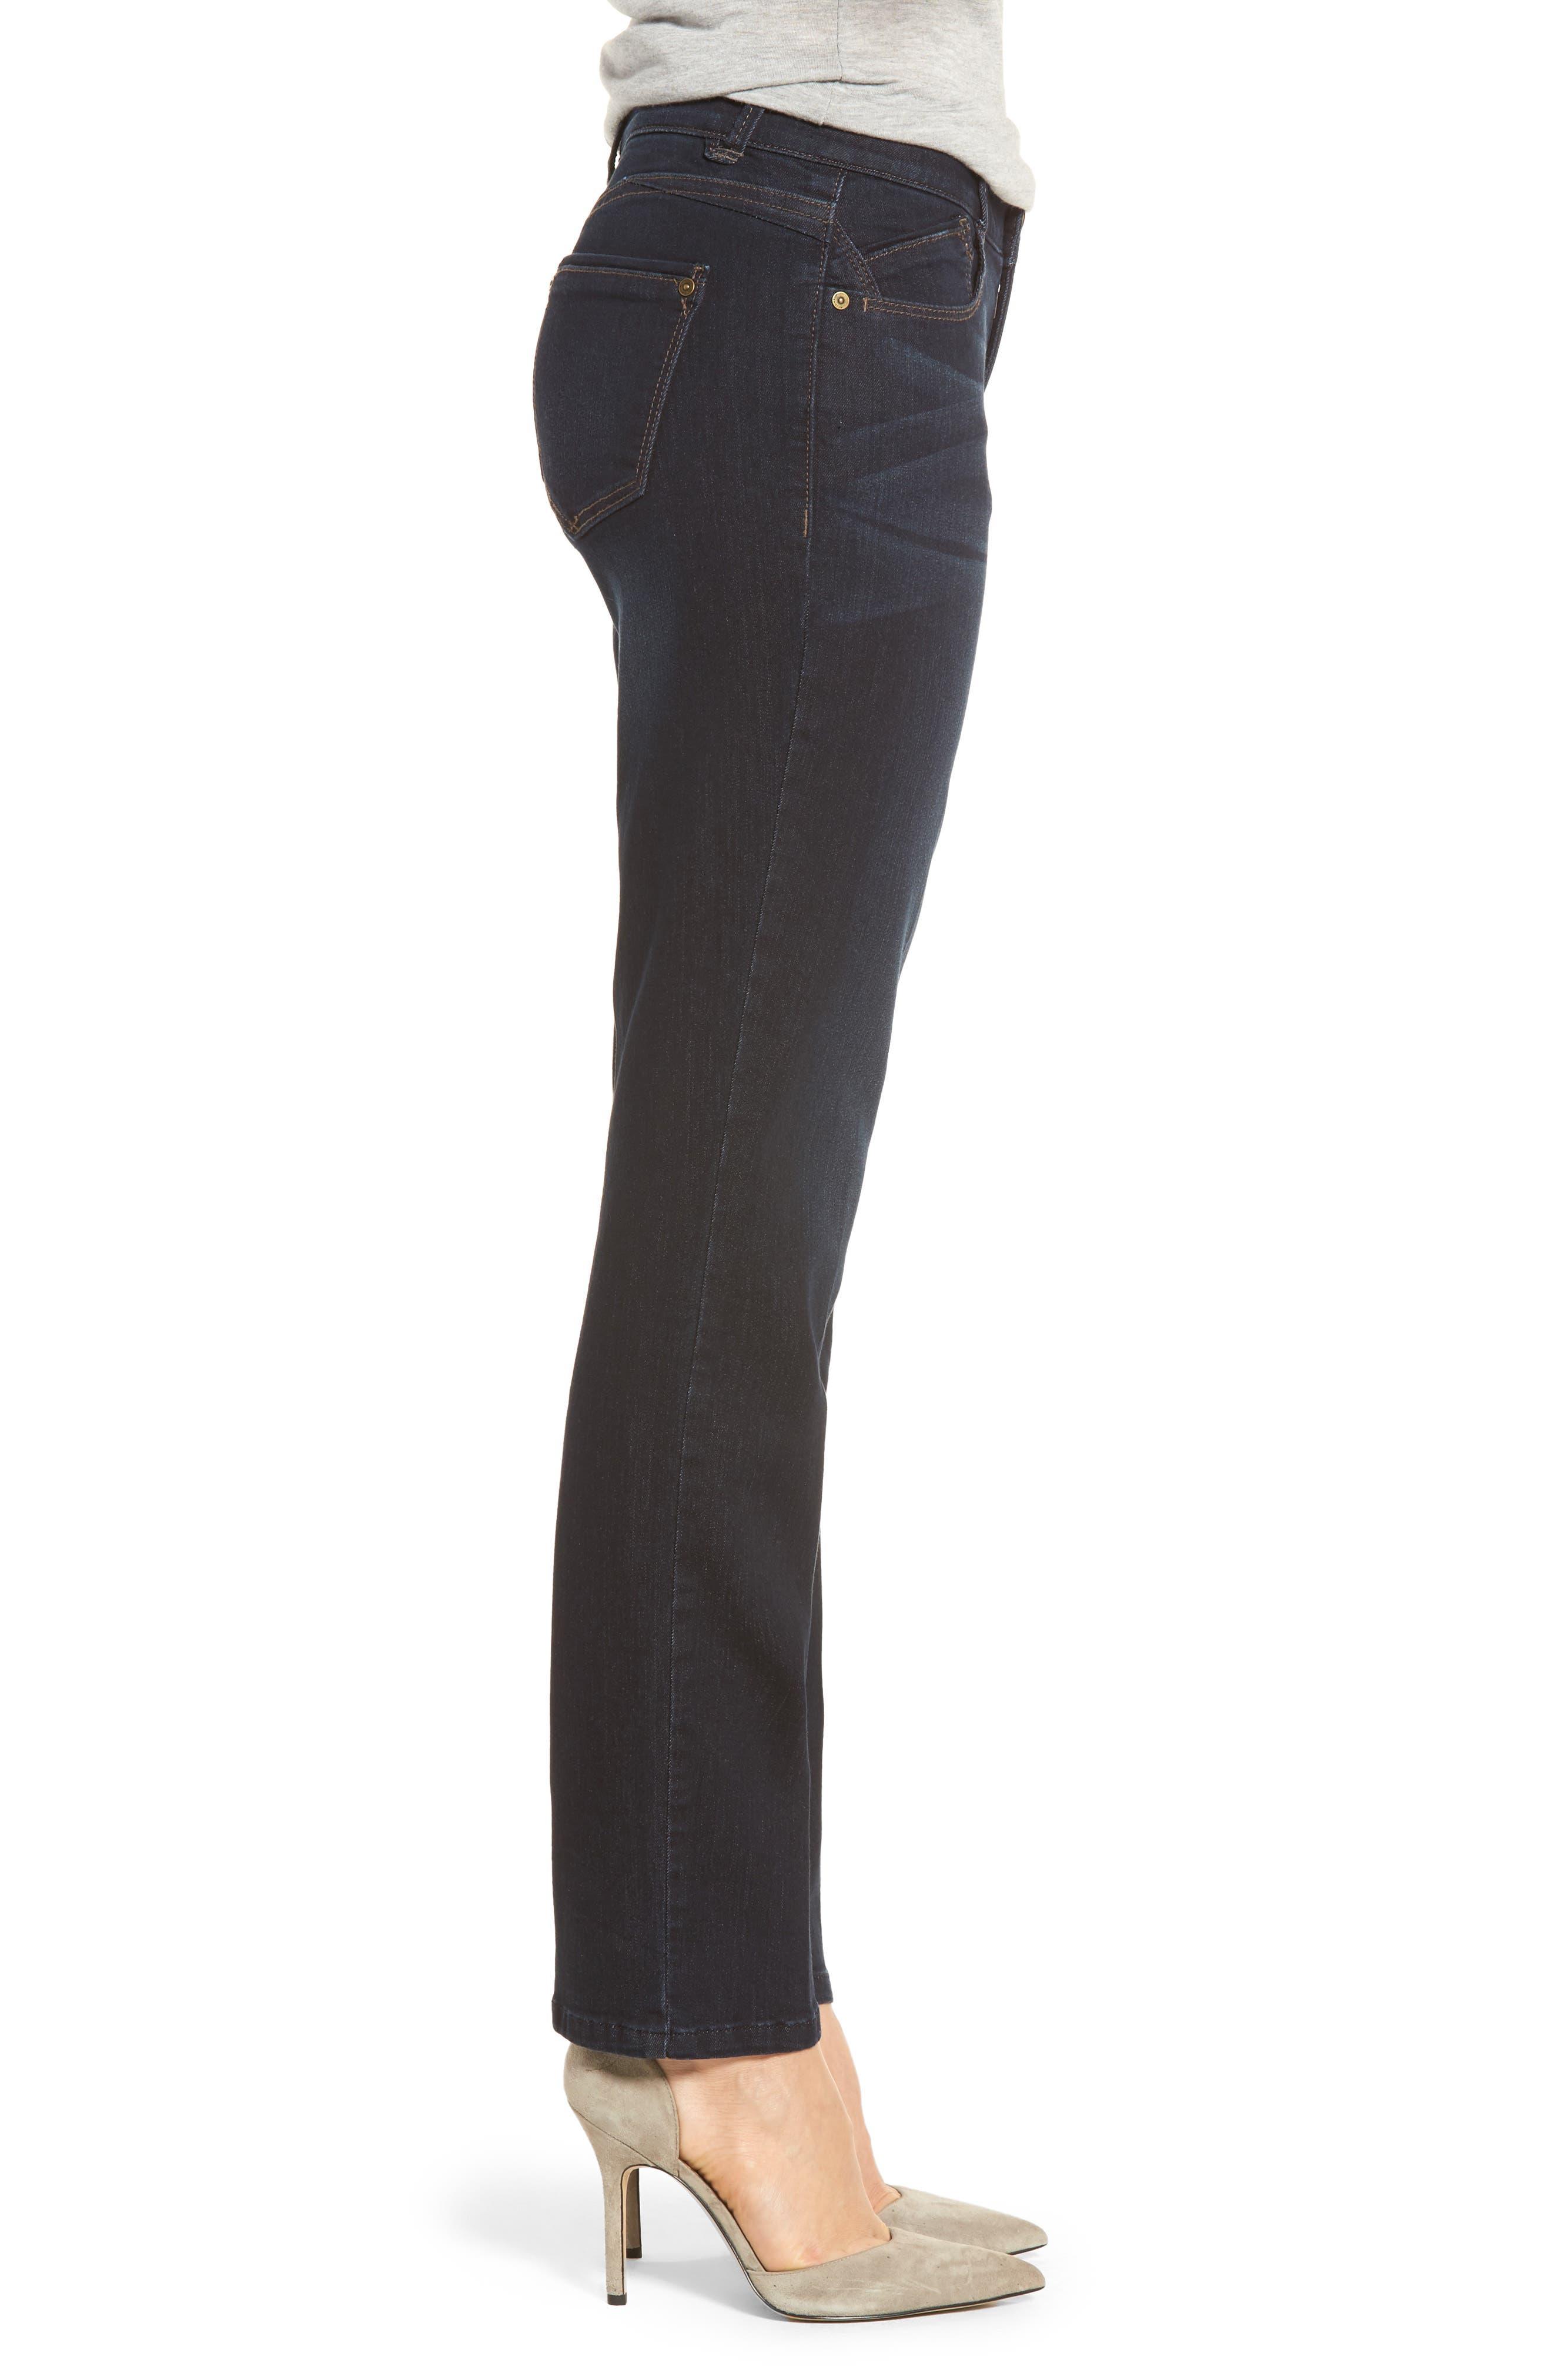 Alternate Image 3  - Wit & Wisdom Ab-solution Straight Leg Jeans (Regular & Petite) (Nordstrom Exclusive)